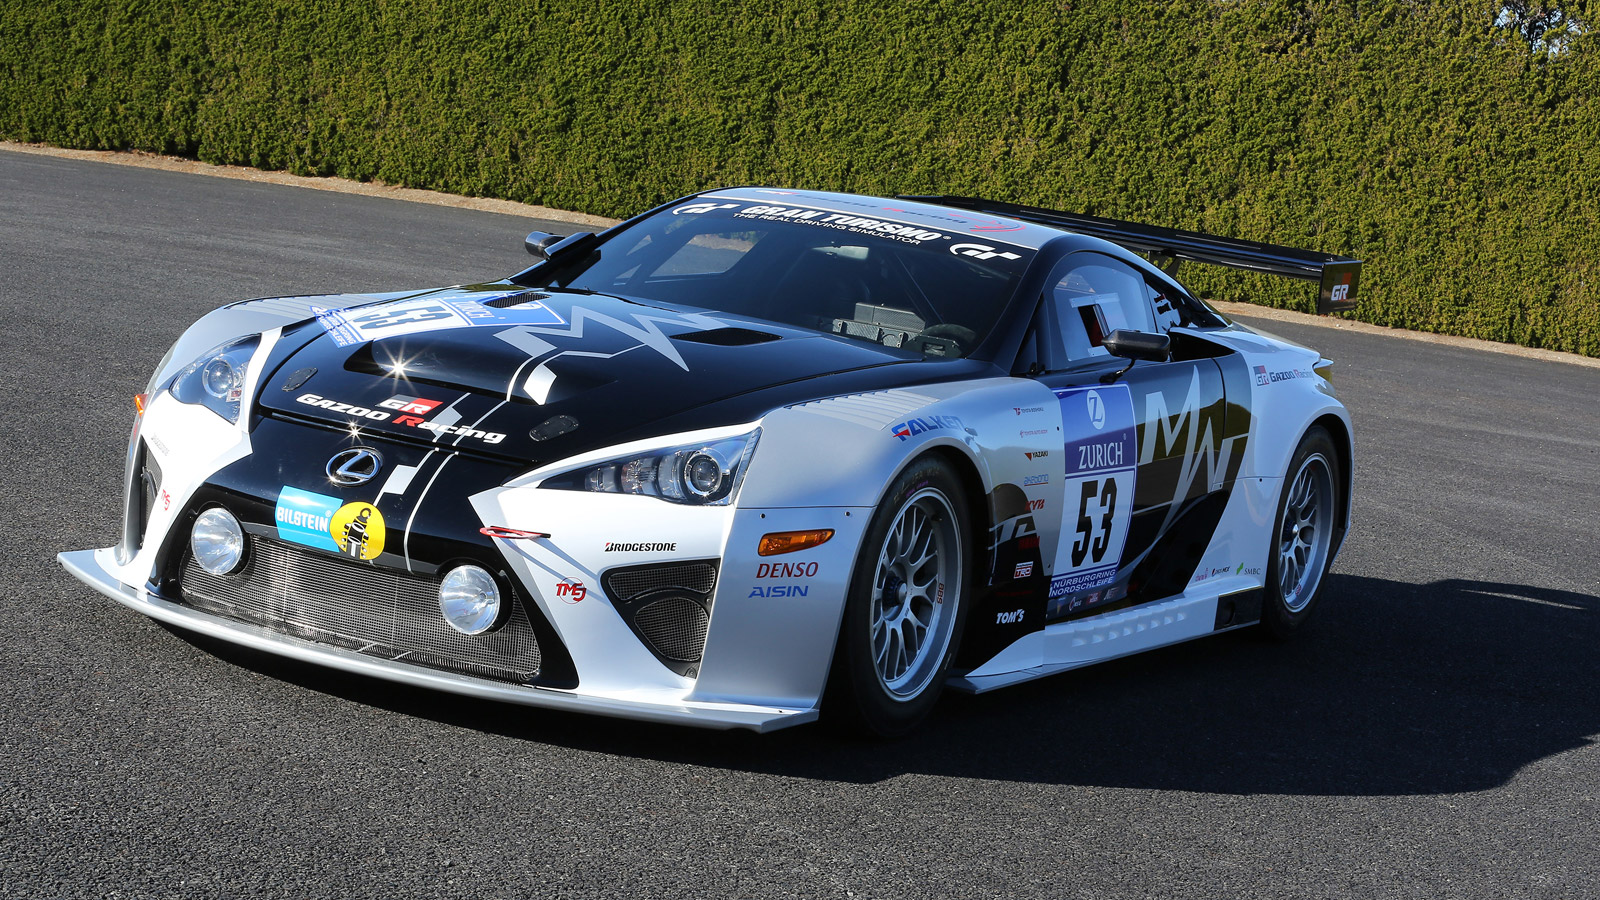 Lexus Reveals Upgraded LFA Code X Race Car For 2014 Nürburgring 24 Hours